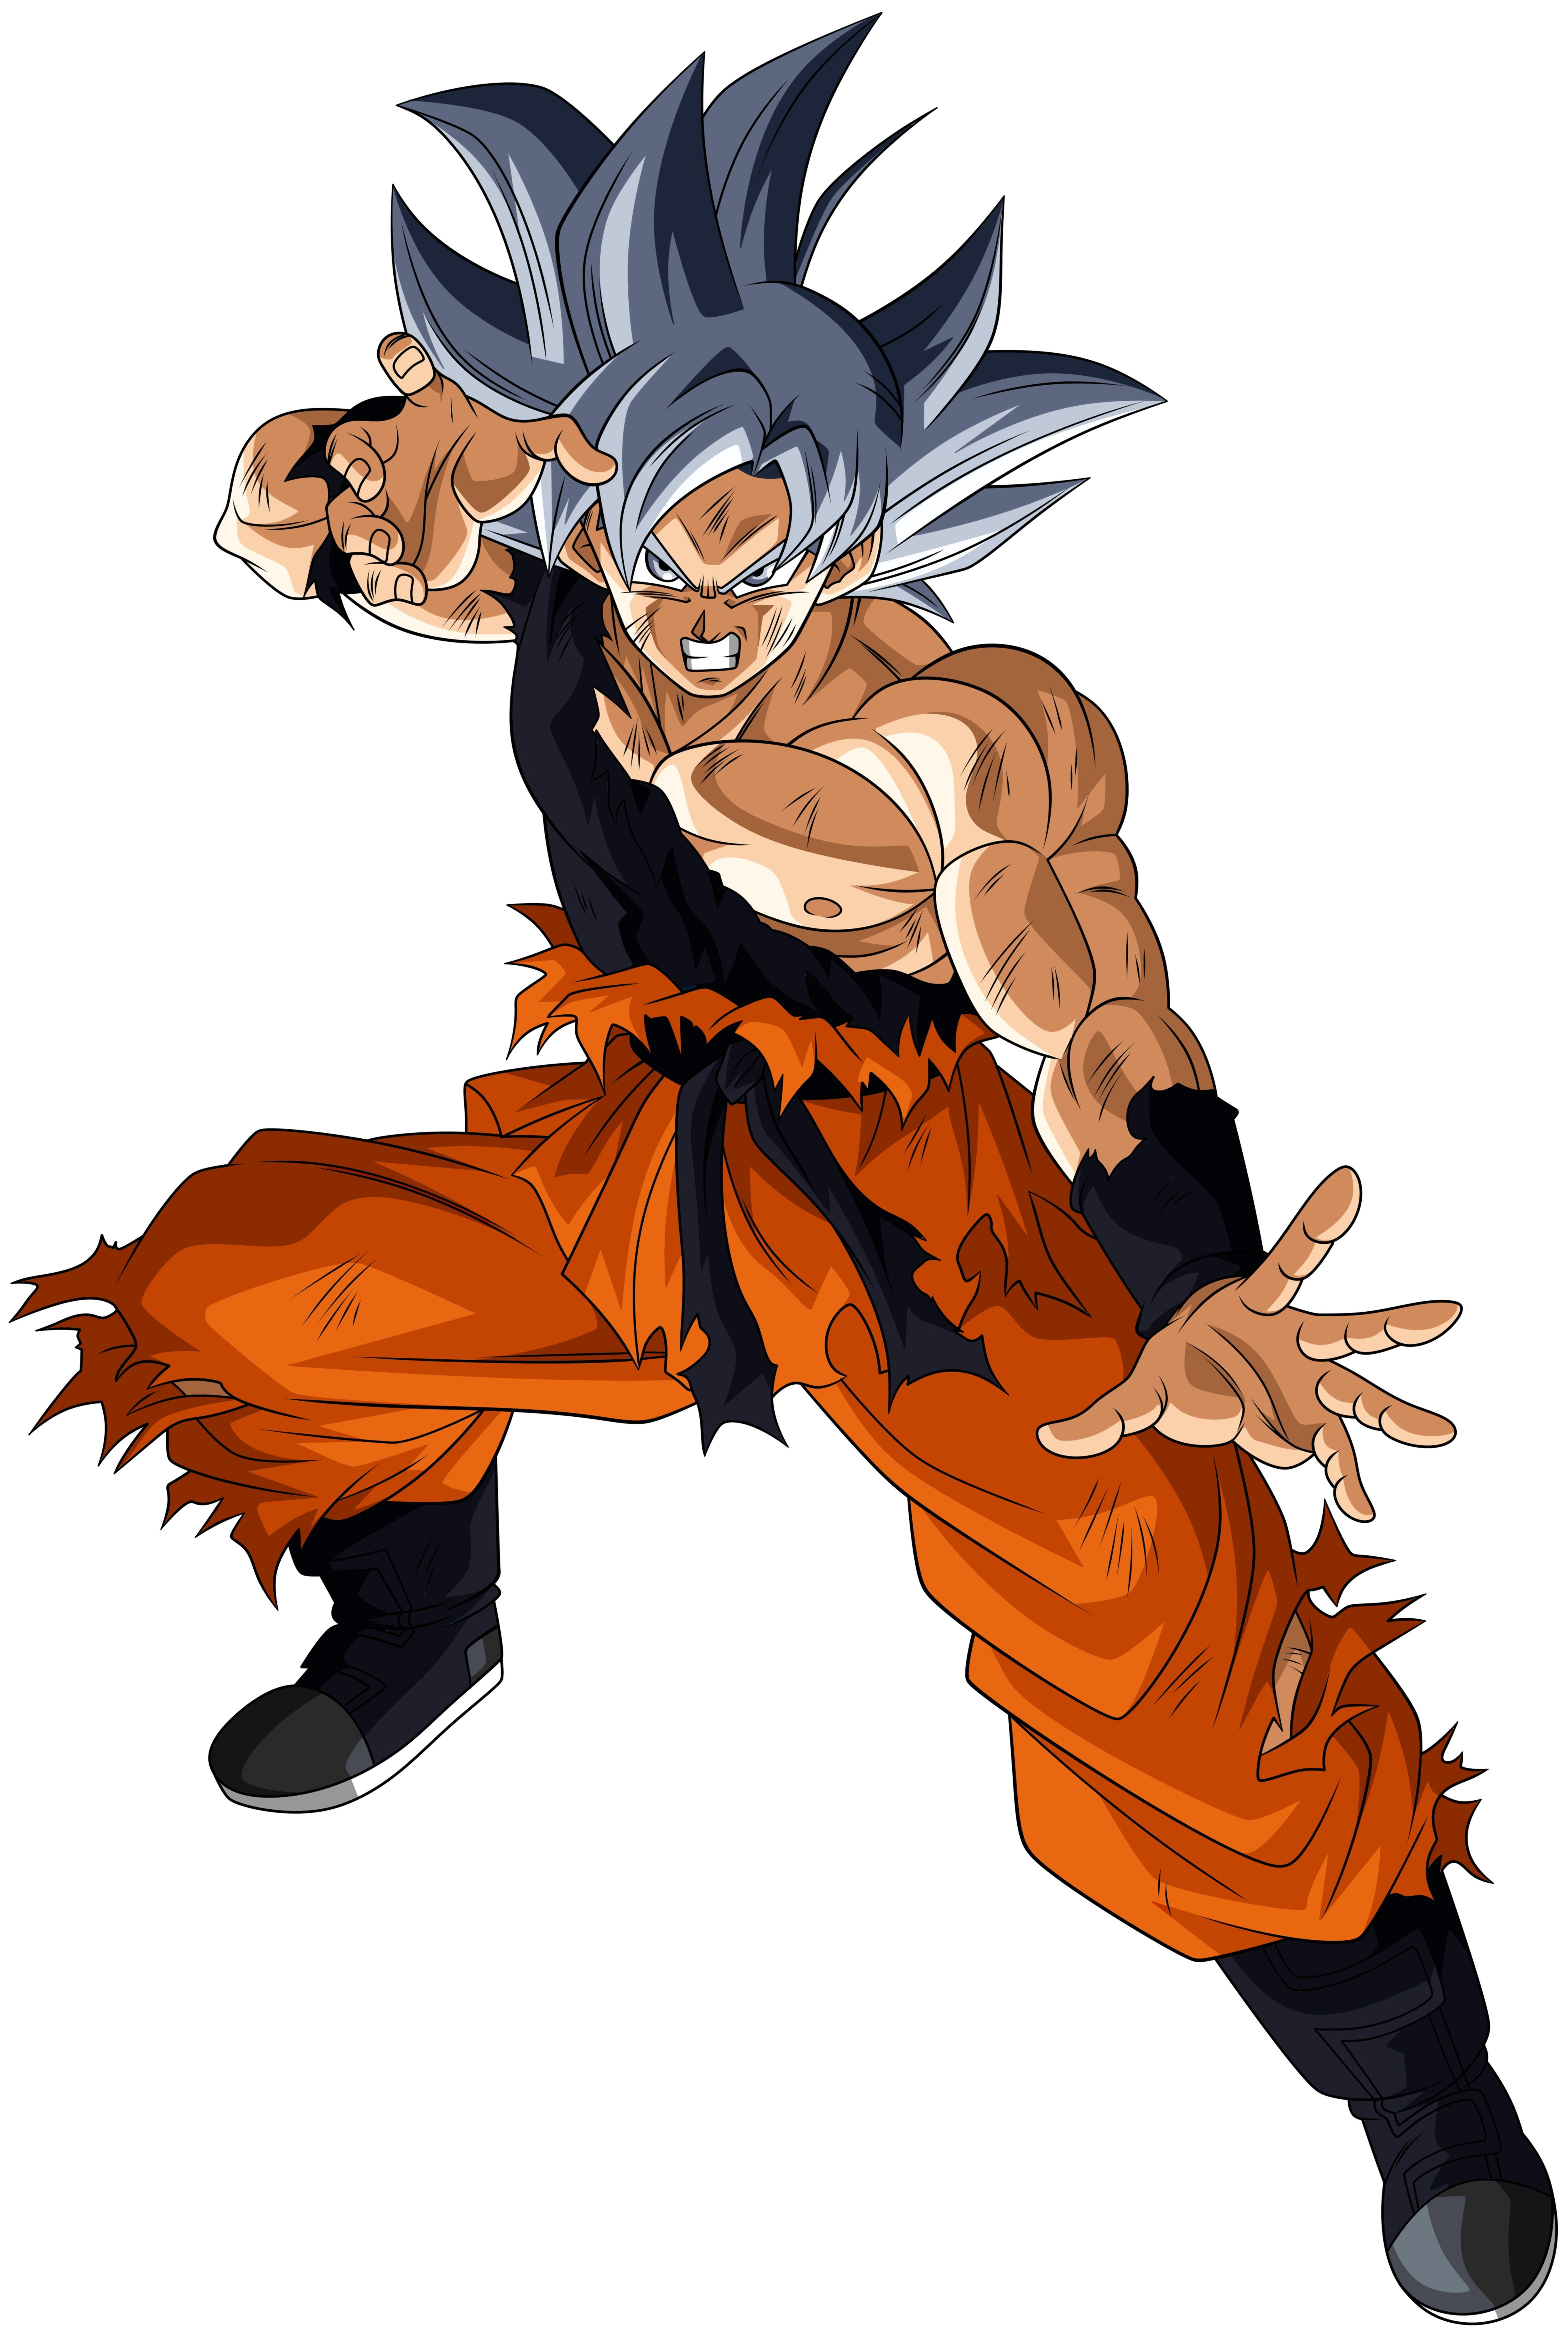 Goku Ultra Instinto Dominado Universo 7 In 2020 Dragon Ball Super Manga Anime Dragon Ball Super Dragon Ball Super Goku